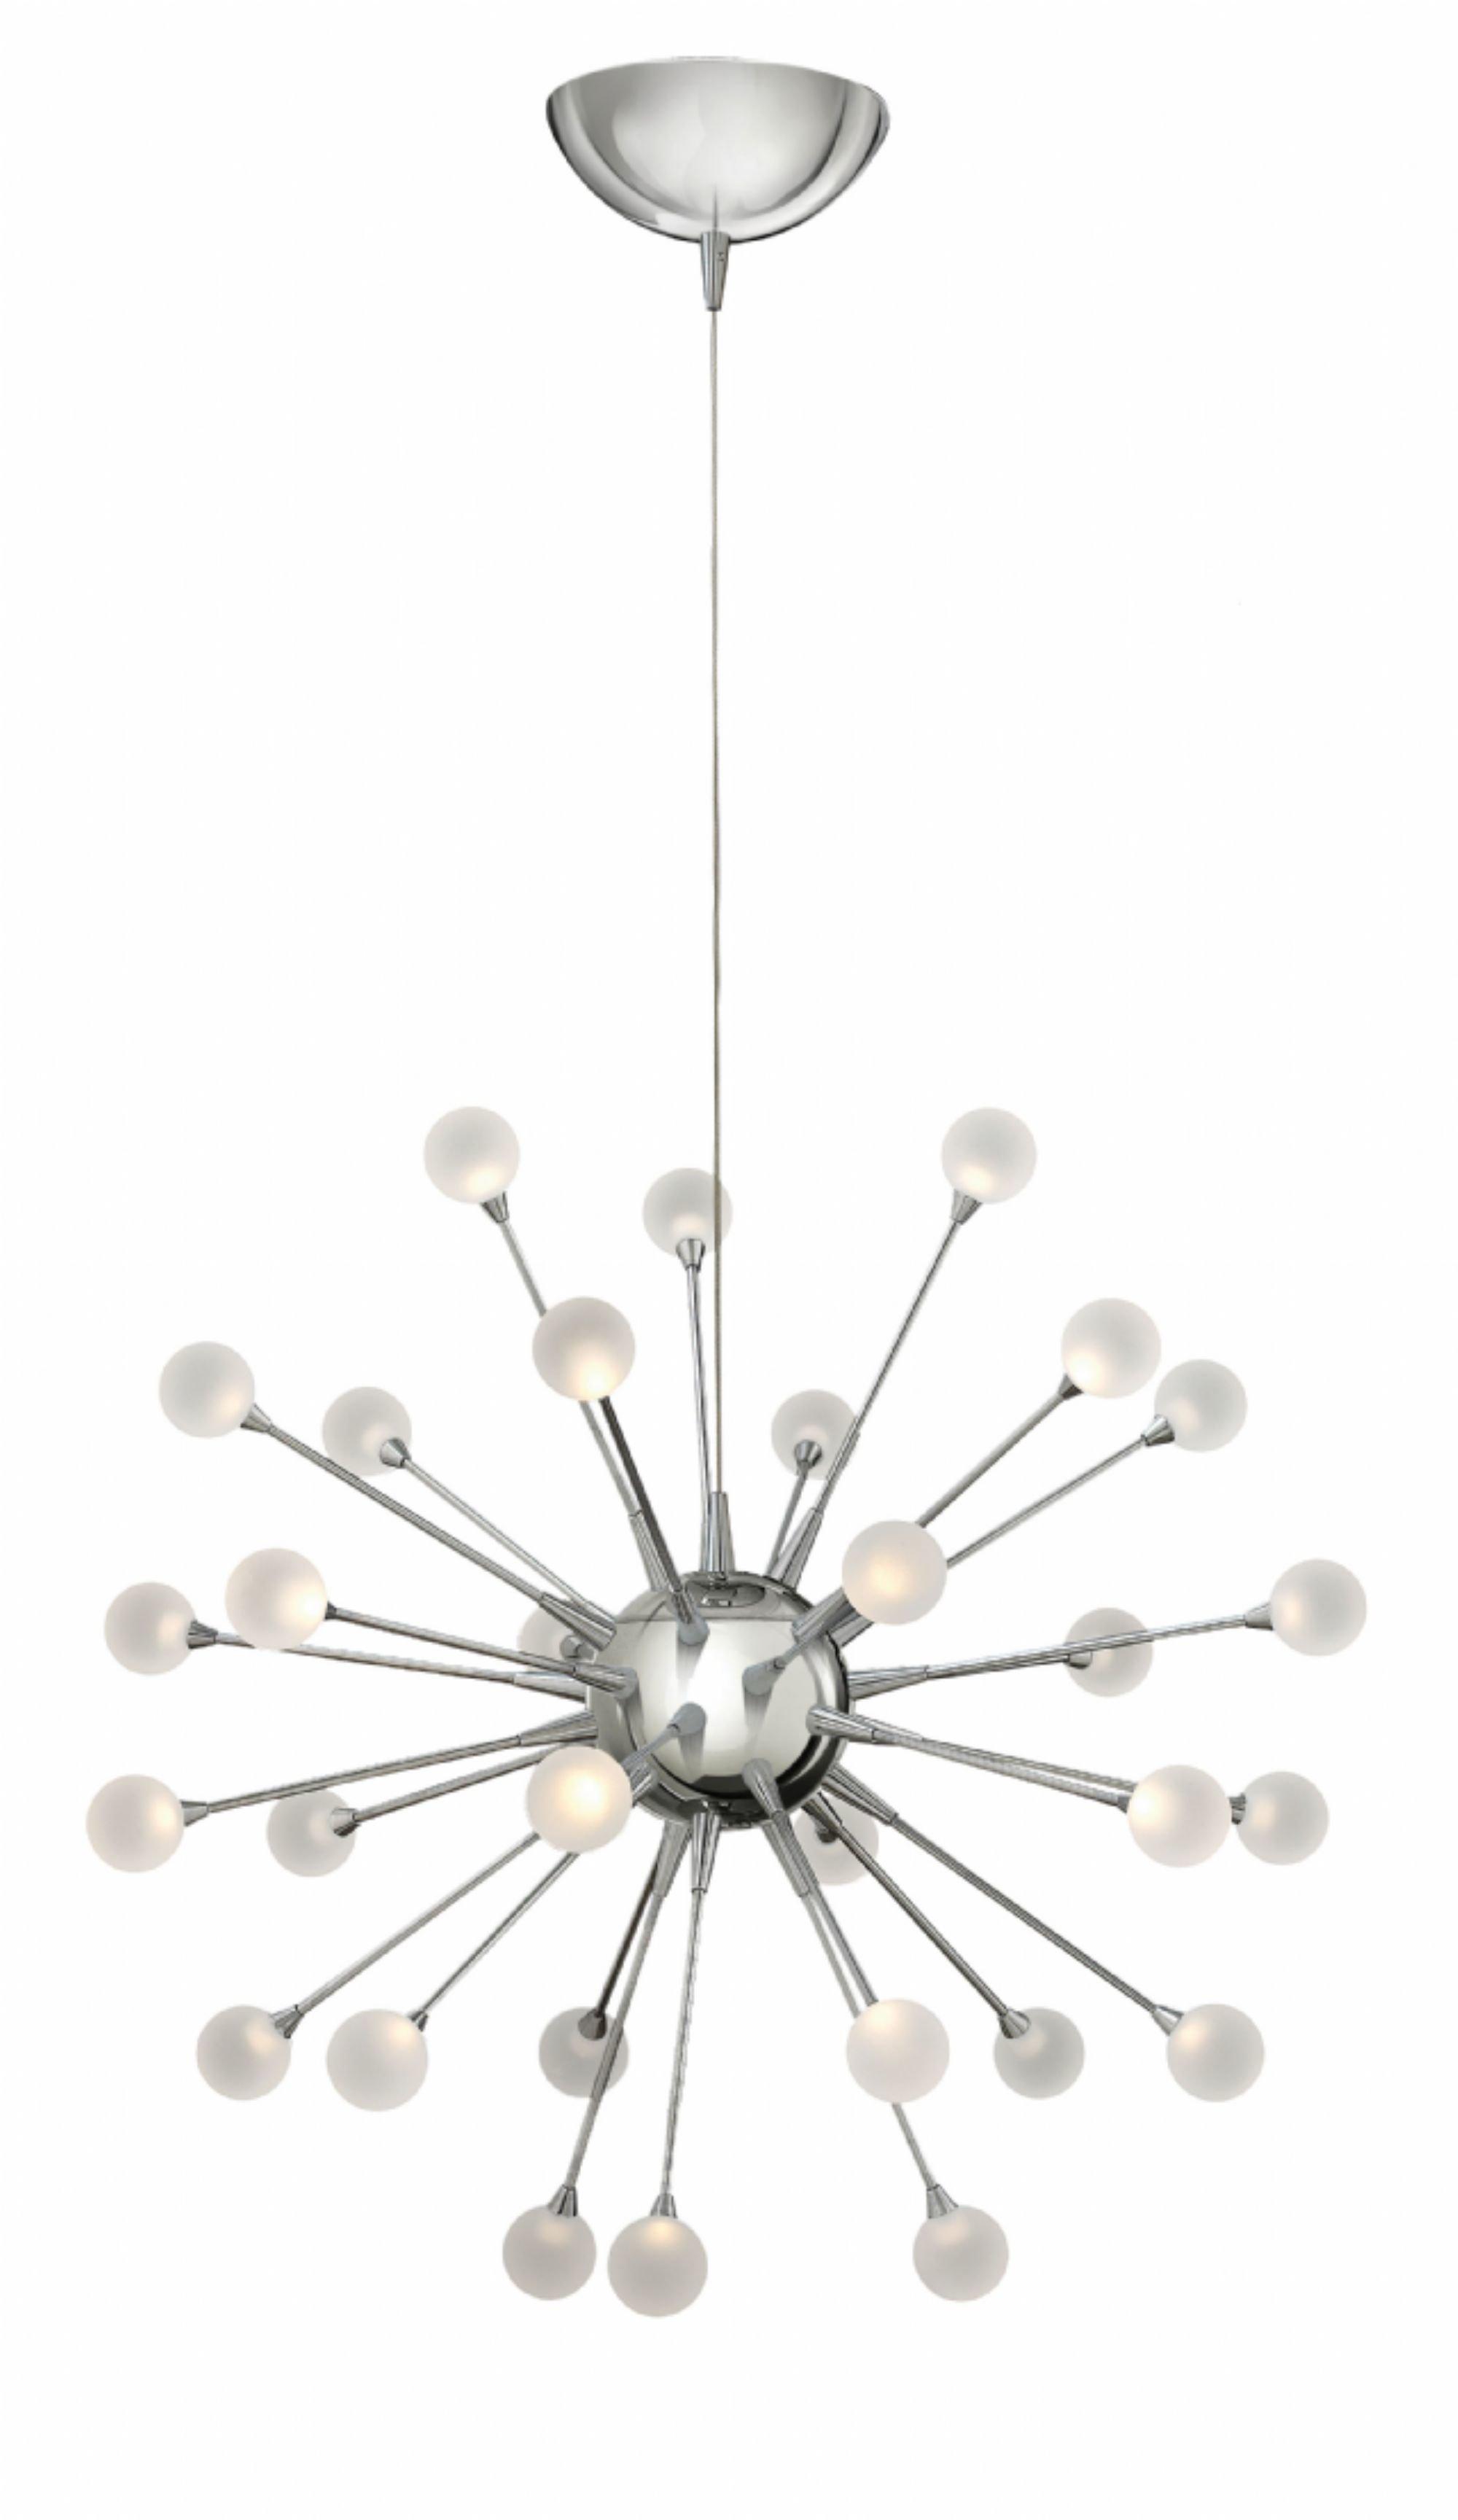 Impulse 30 Light Led Sputnik Chandelier Within Bacchus 12 Light Sputnik Chandeliers (Gallery 19 of 30)